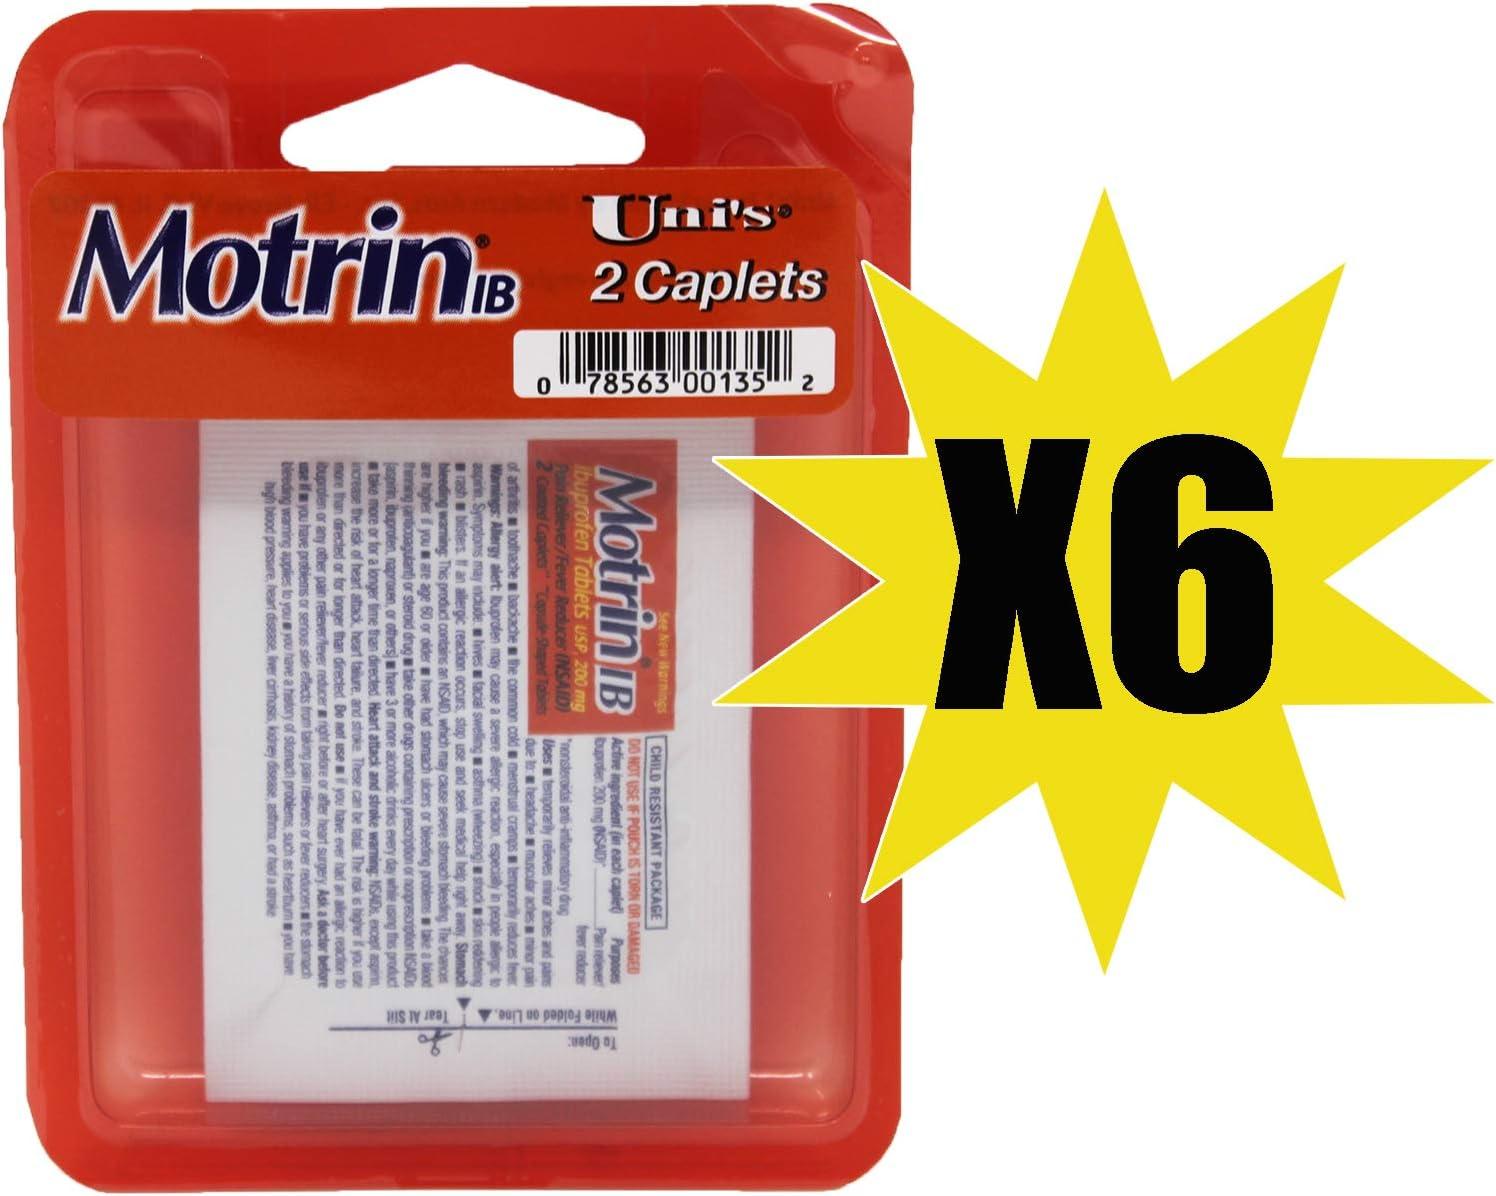 Uni's MotrinIB 6 Count Travel Packs (2 Caplets Per Pack) TSA App